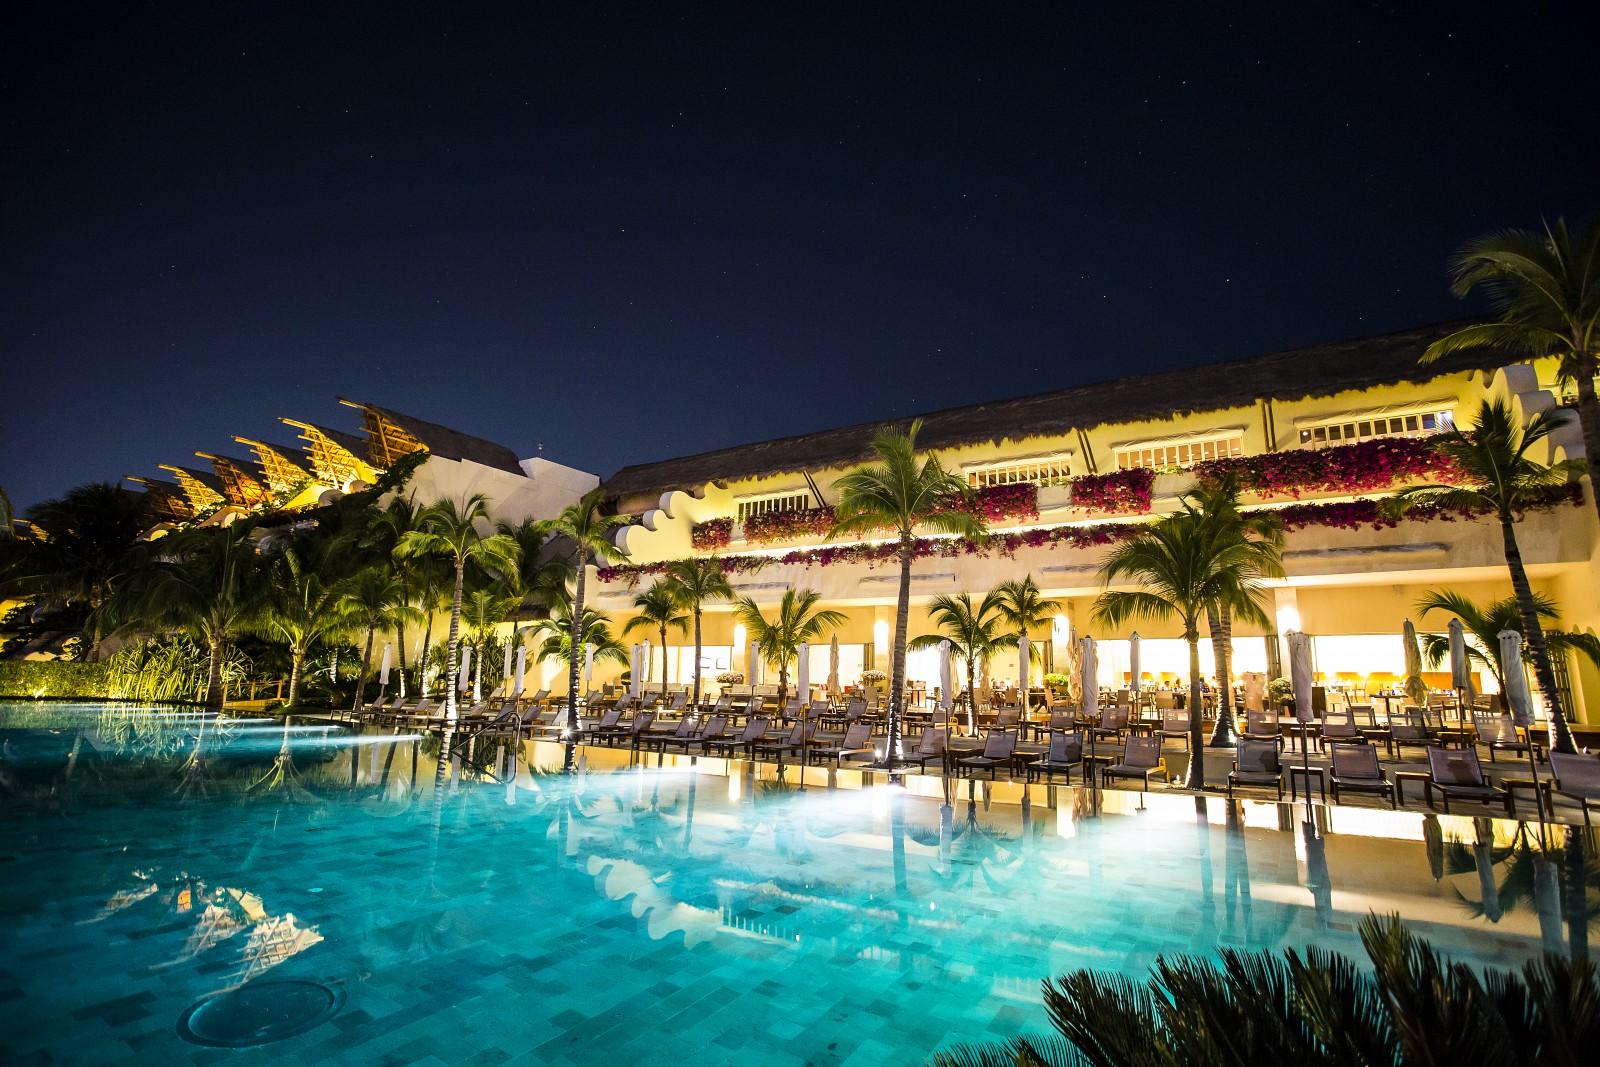 Travel Agency All-Inclusive Resort Grand Velas Riviera Maya 007